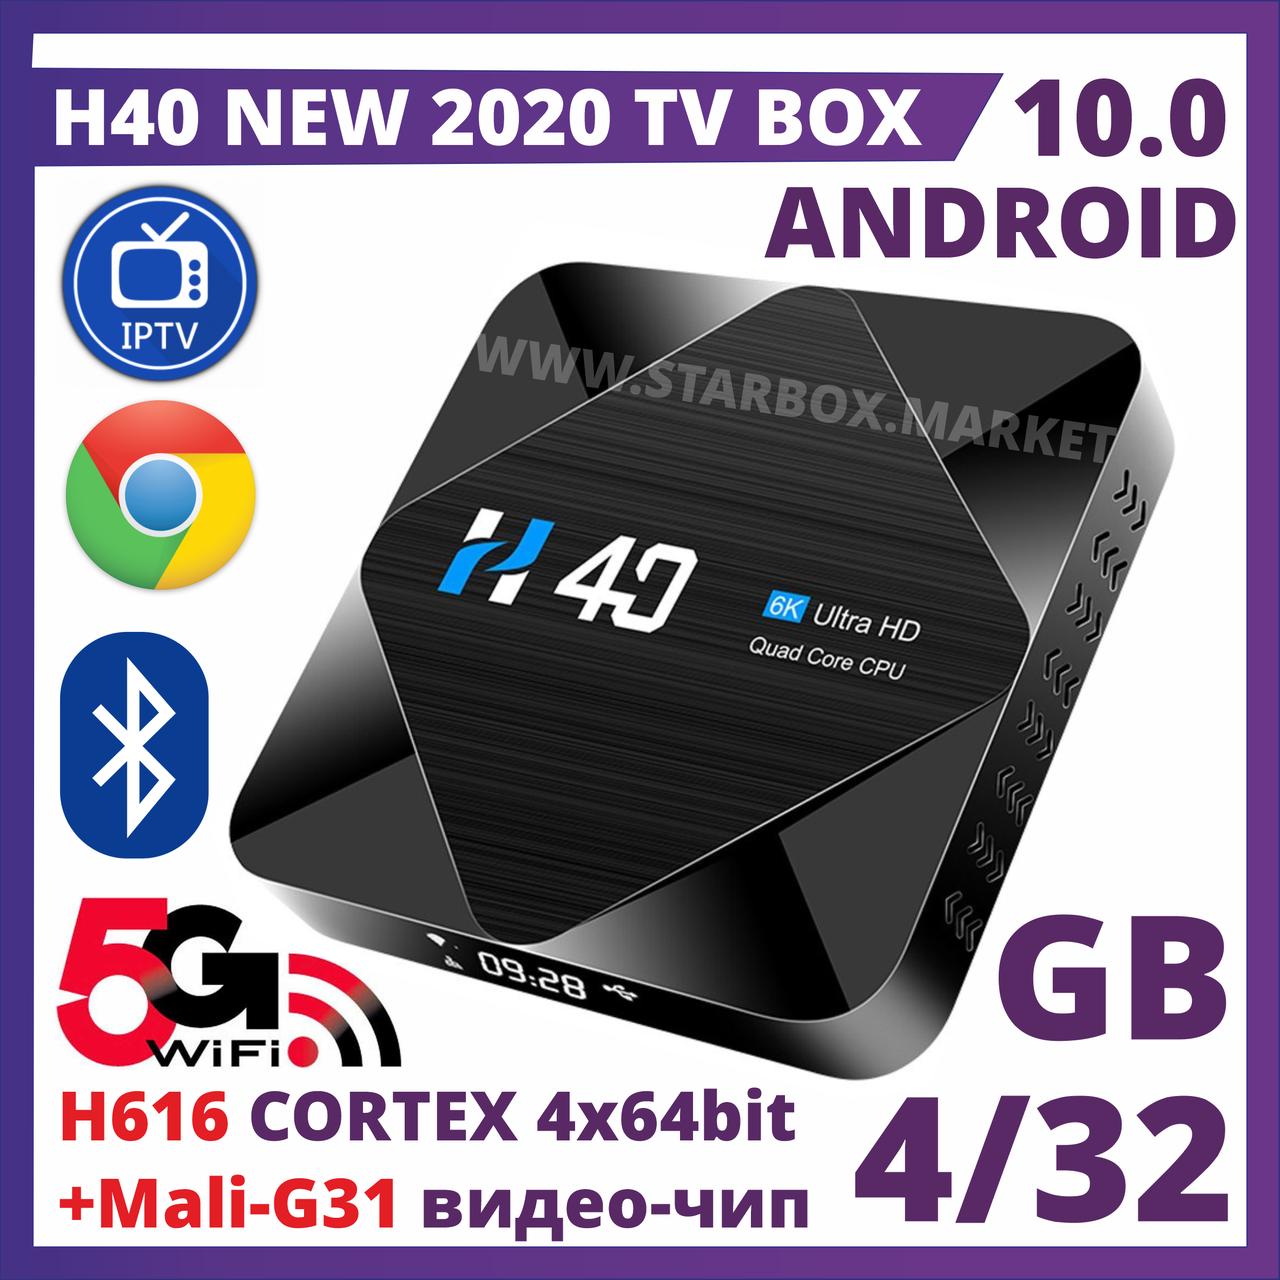 H40 Smart TV Box 4 32gb Android 10.0 Allwinner UHD 6K Медиаплеер Cortex A53 H616,ТВ приставка андроид smartbox